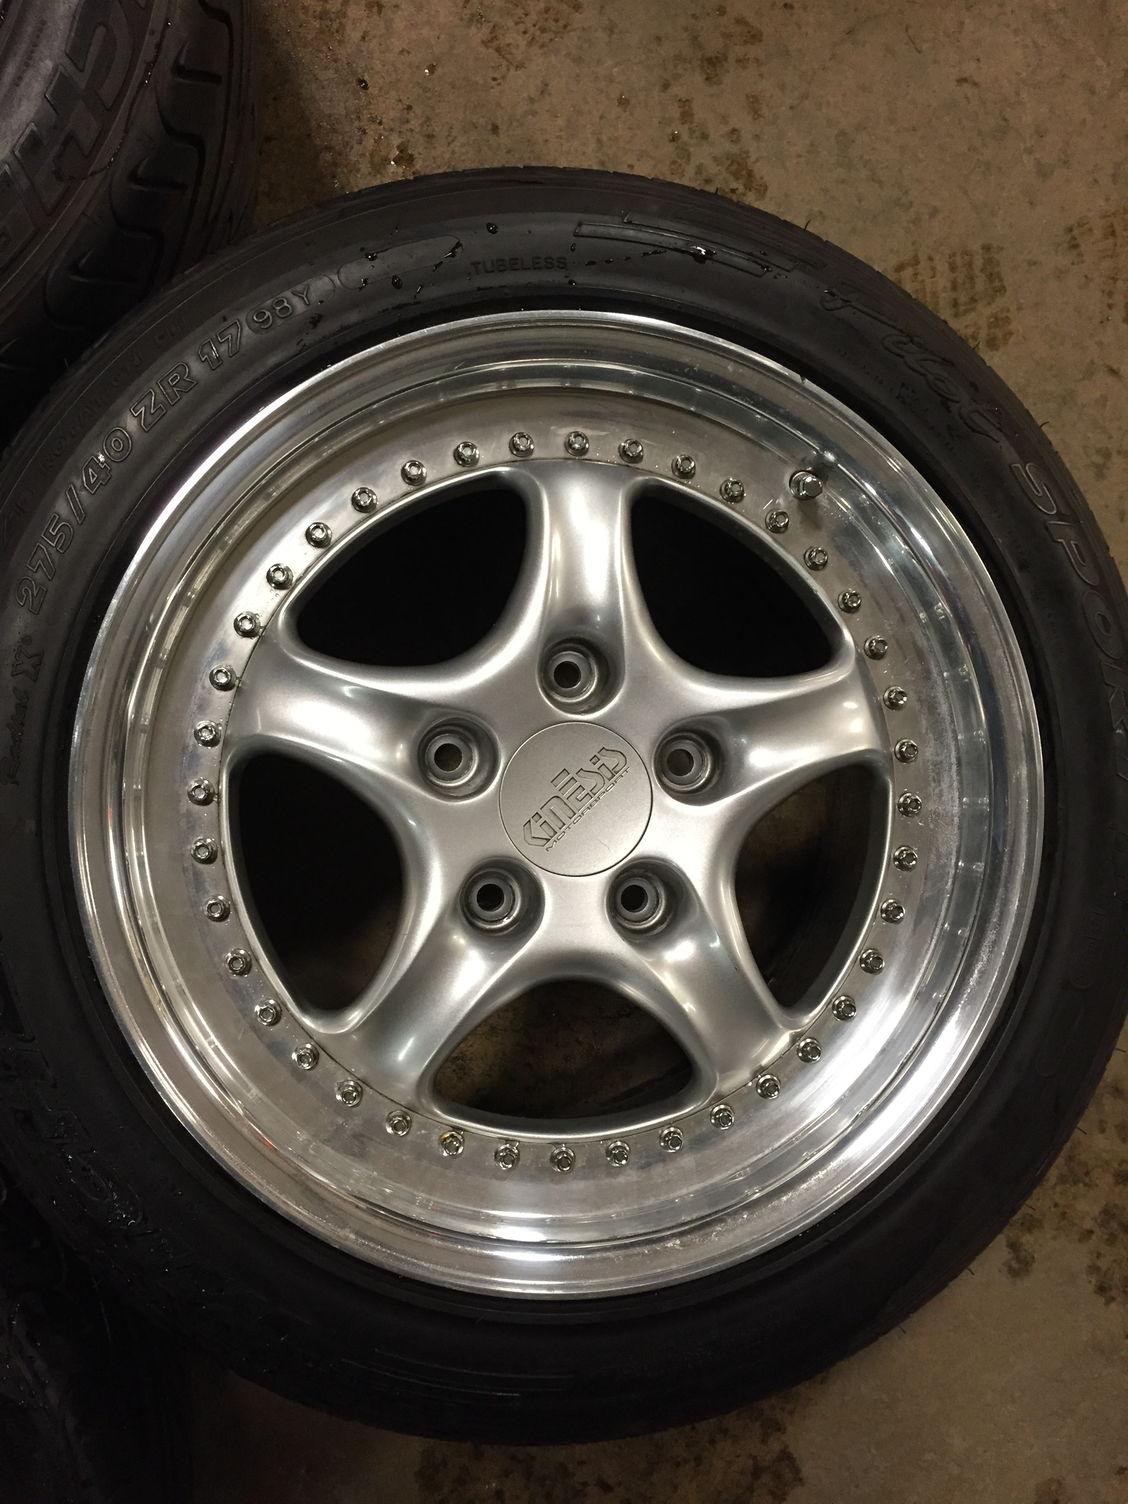 Fs Kinesis Supercup Wheels For 951 944 964 993 Rennlist